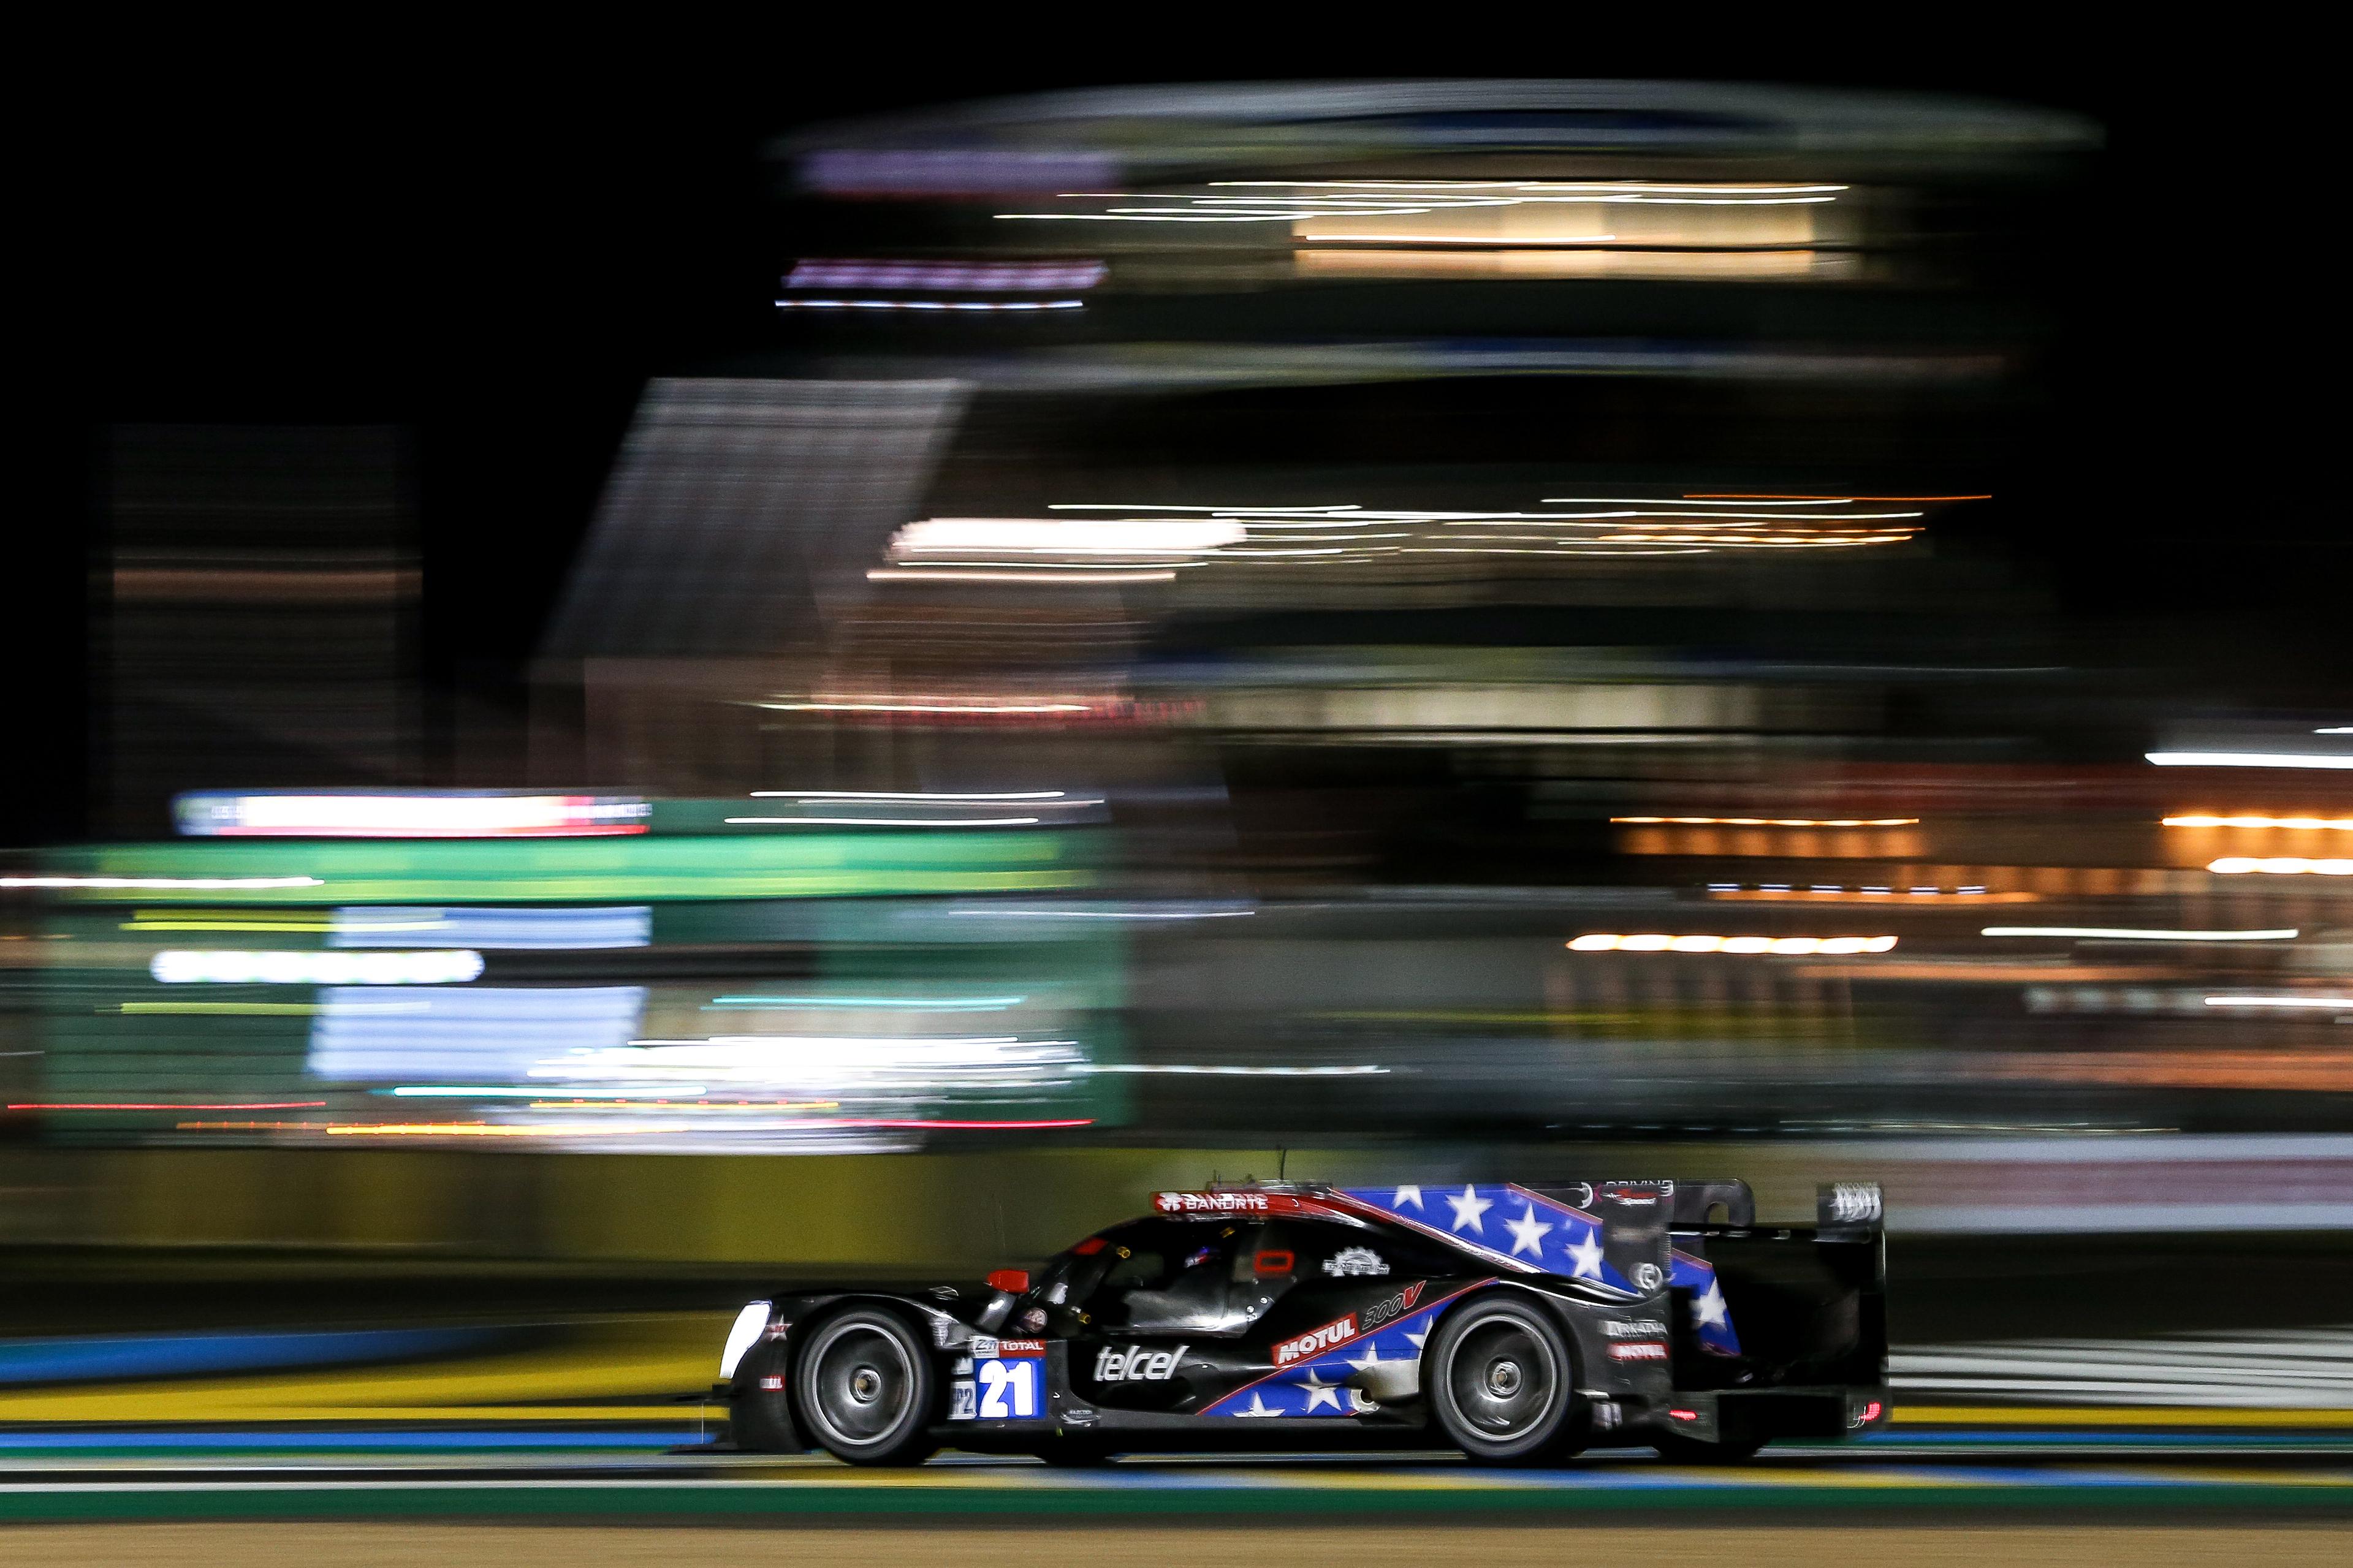 Timothee Buret, Juan Pablo Montoya, Memo Rojas, Le Mans 24 Hours, DragonSpeed